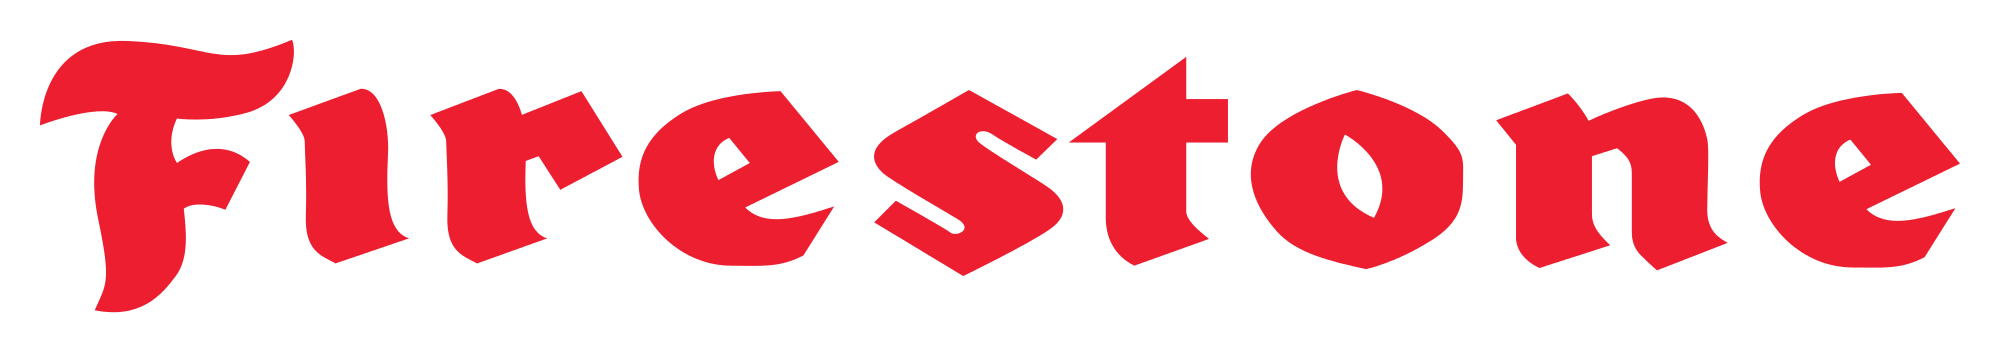 Le logo du manufacturier Firestone